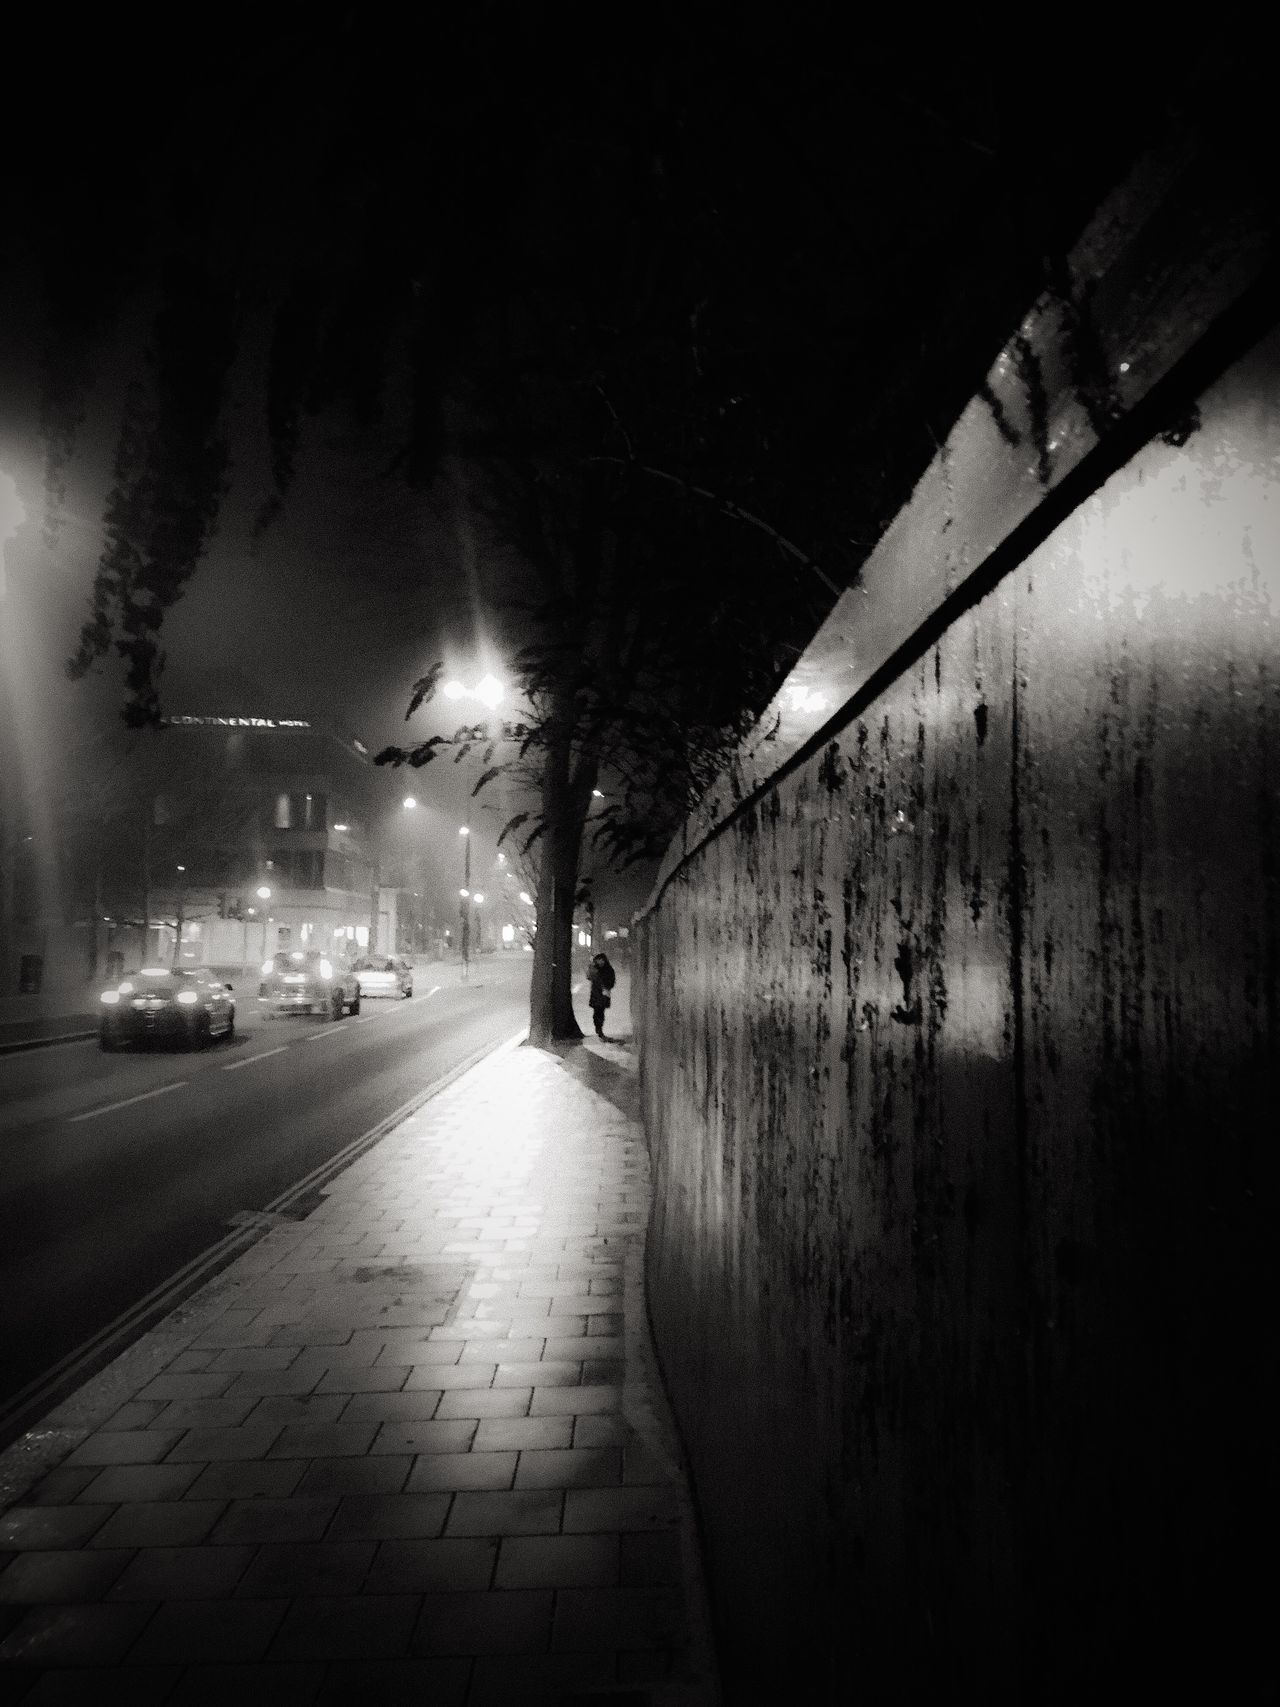 Street Photography Illuminated Night EyeEm Best Shots Black And White Fresh On Eyeem  The Week Of Eyeem EyeEm Best Shots - Black + White Streetphotography Silhouette Sidewalk